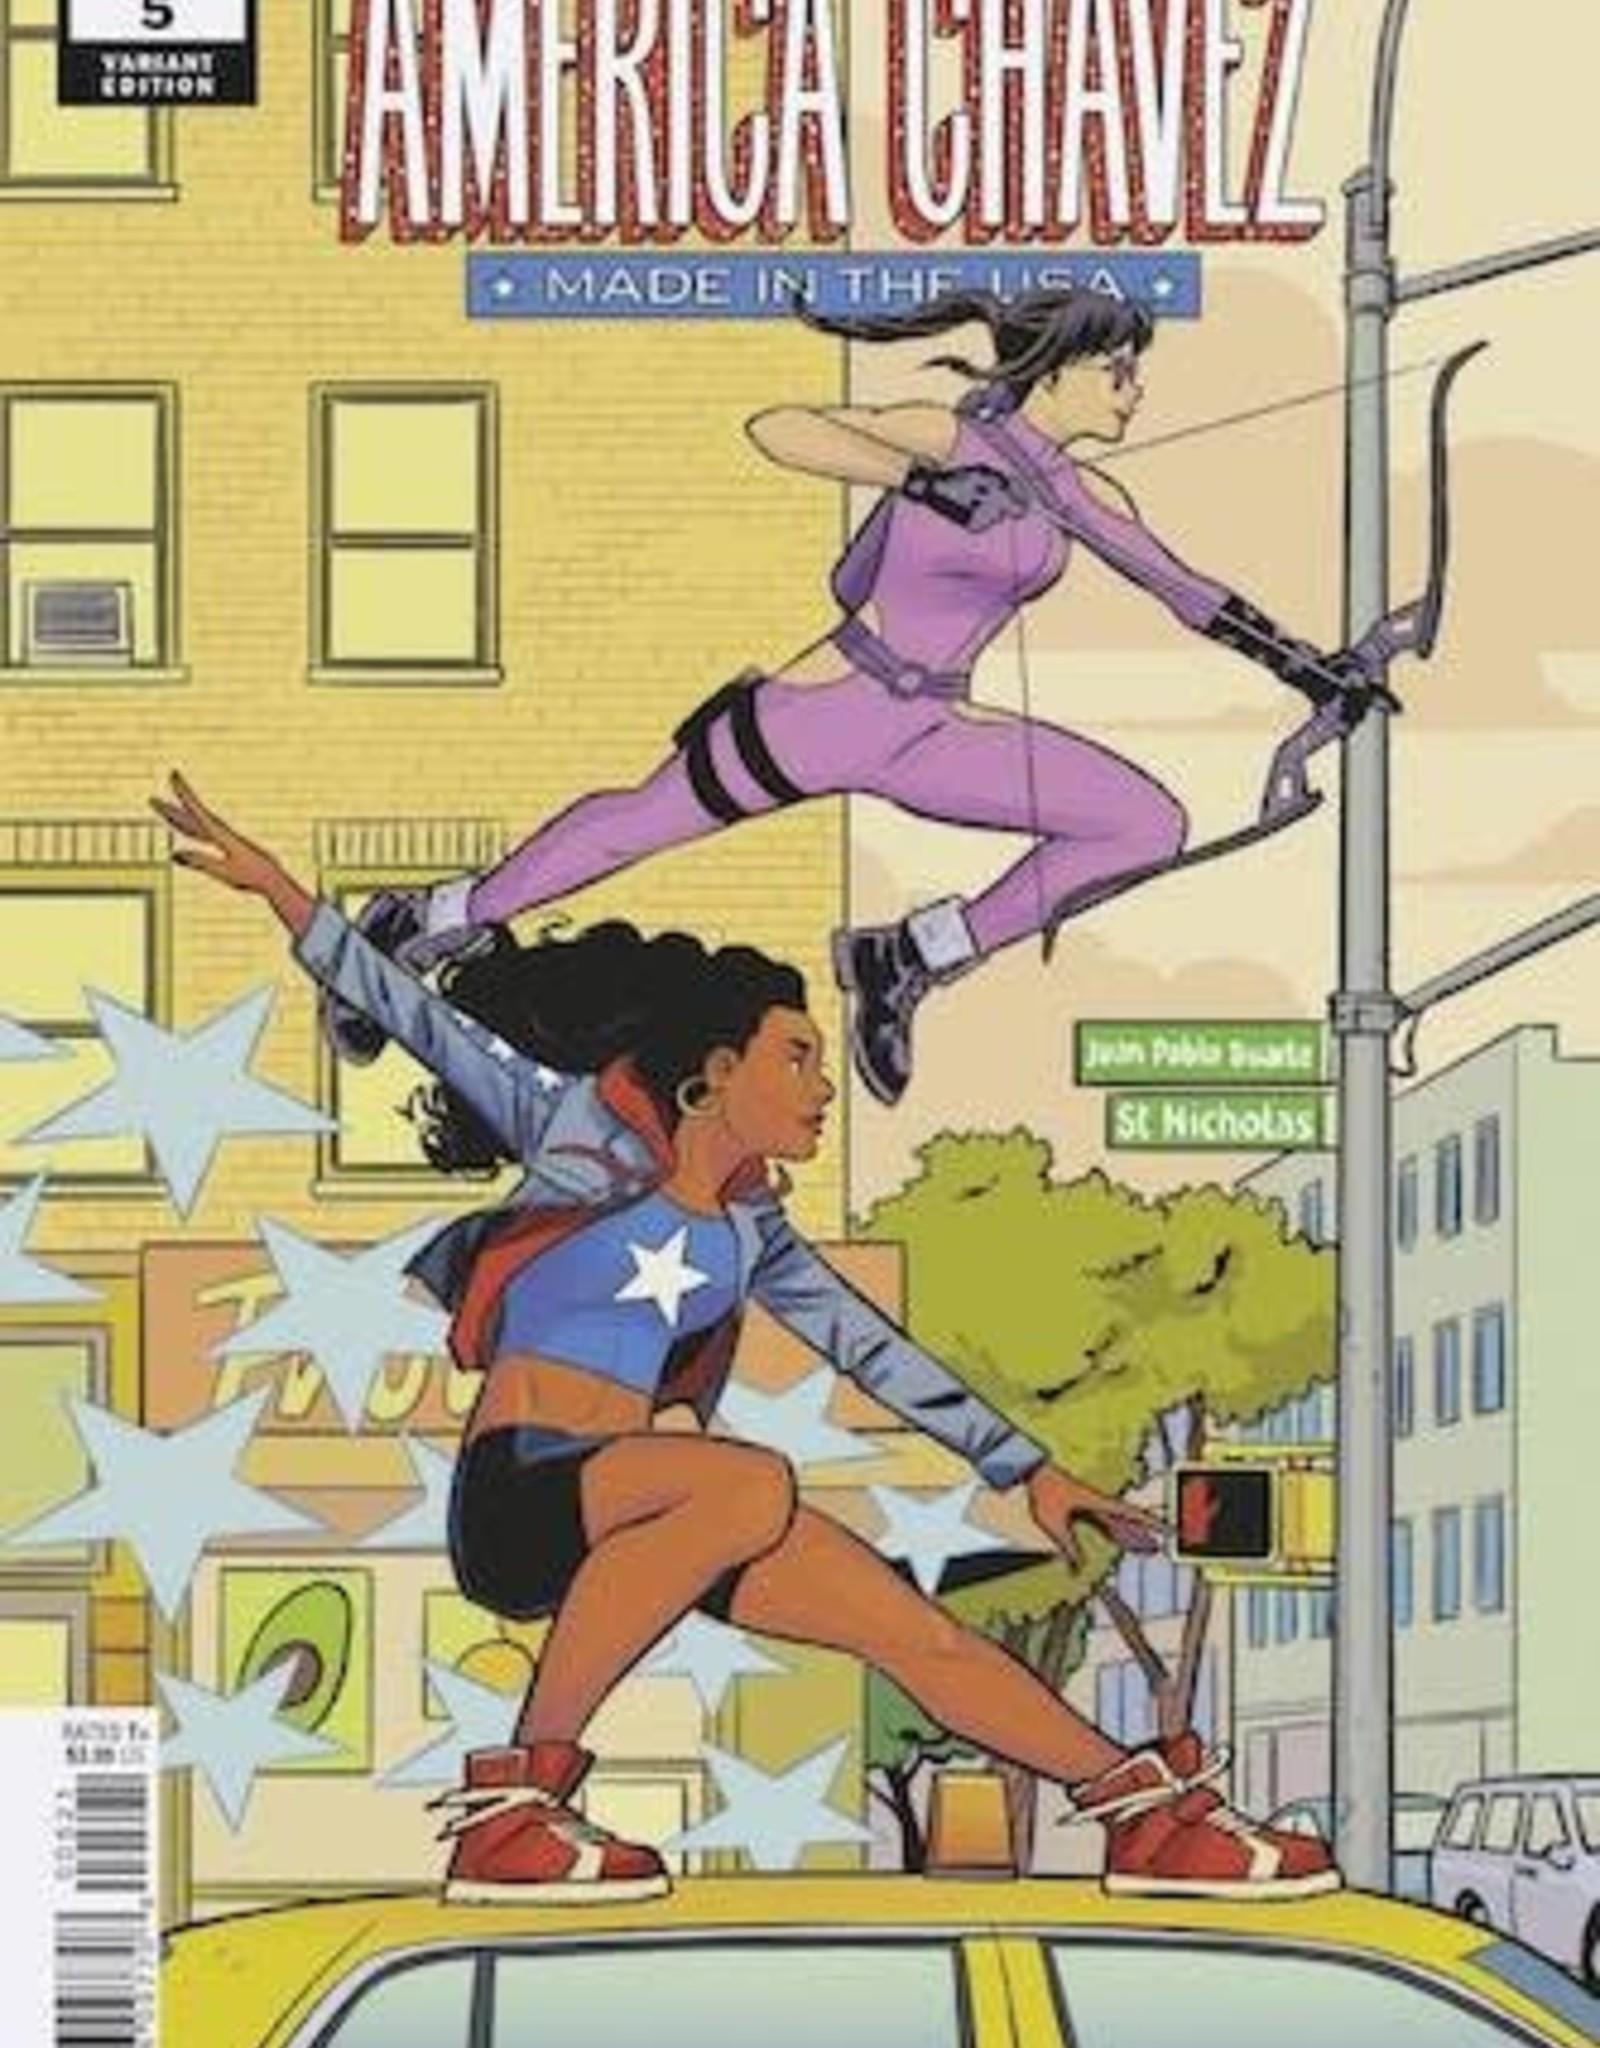 Marvel Comics America Chavez Made In USA #5 Bustos Var